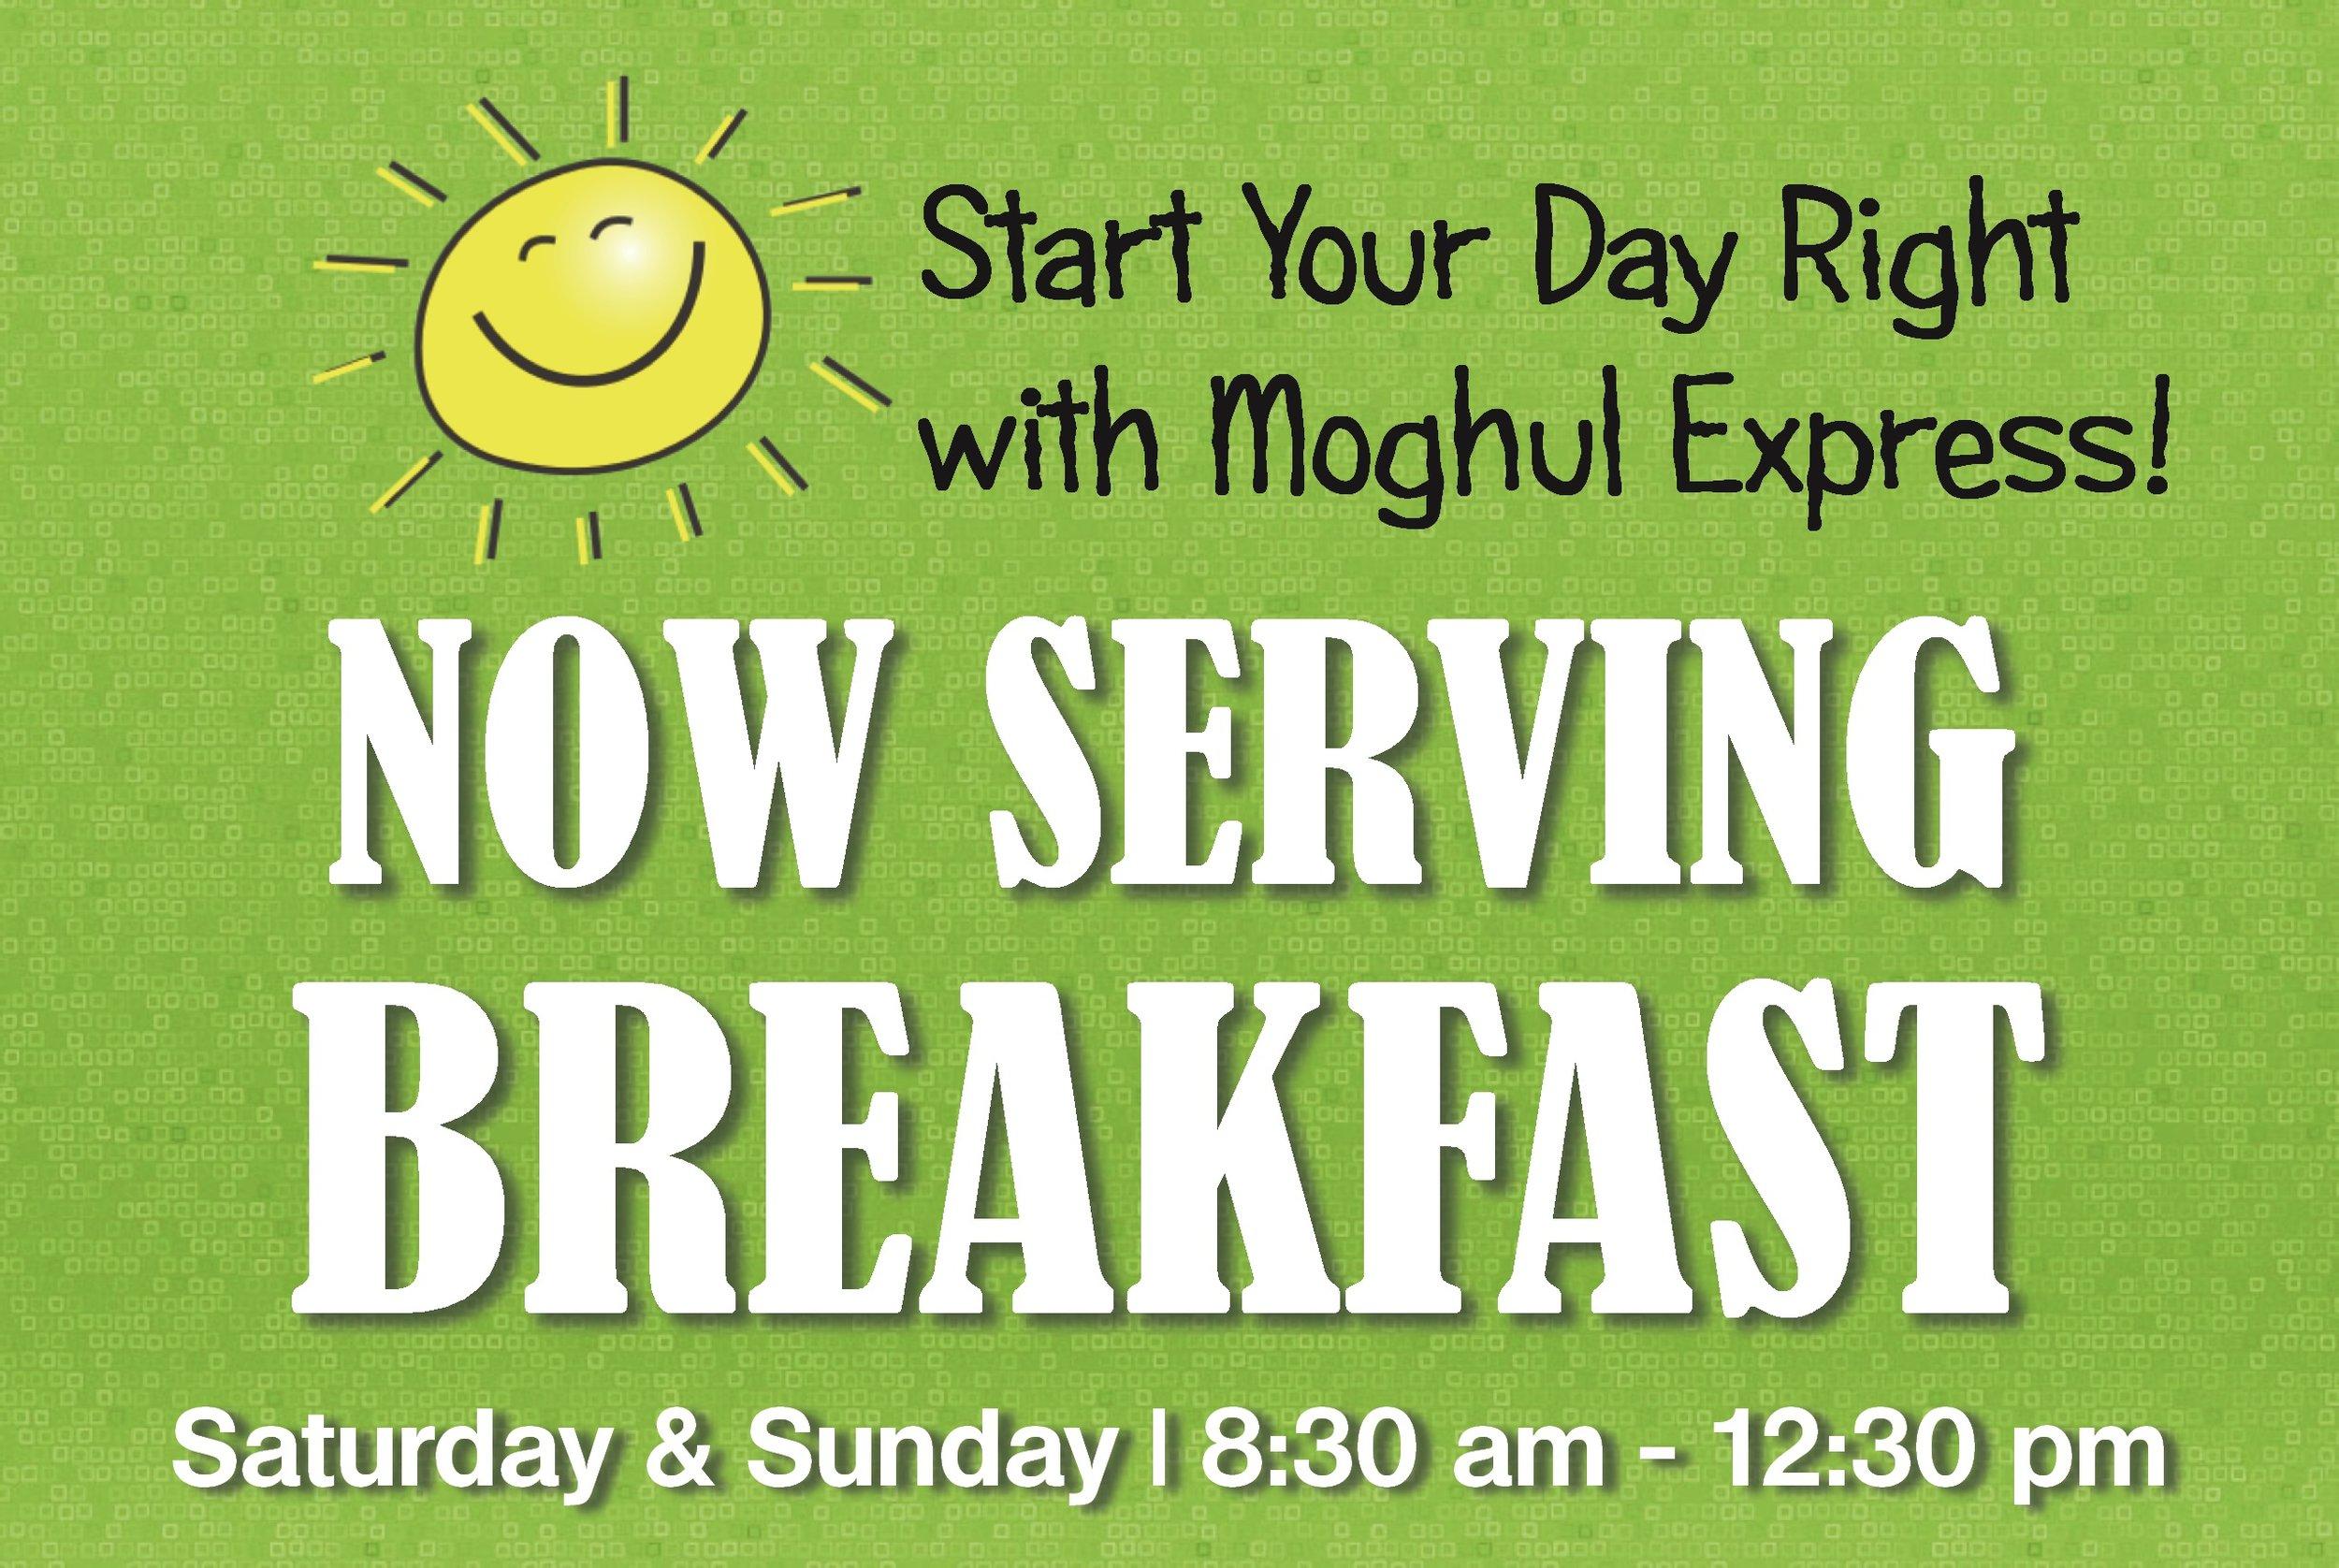 express breakfast banner.jpg